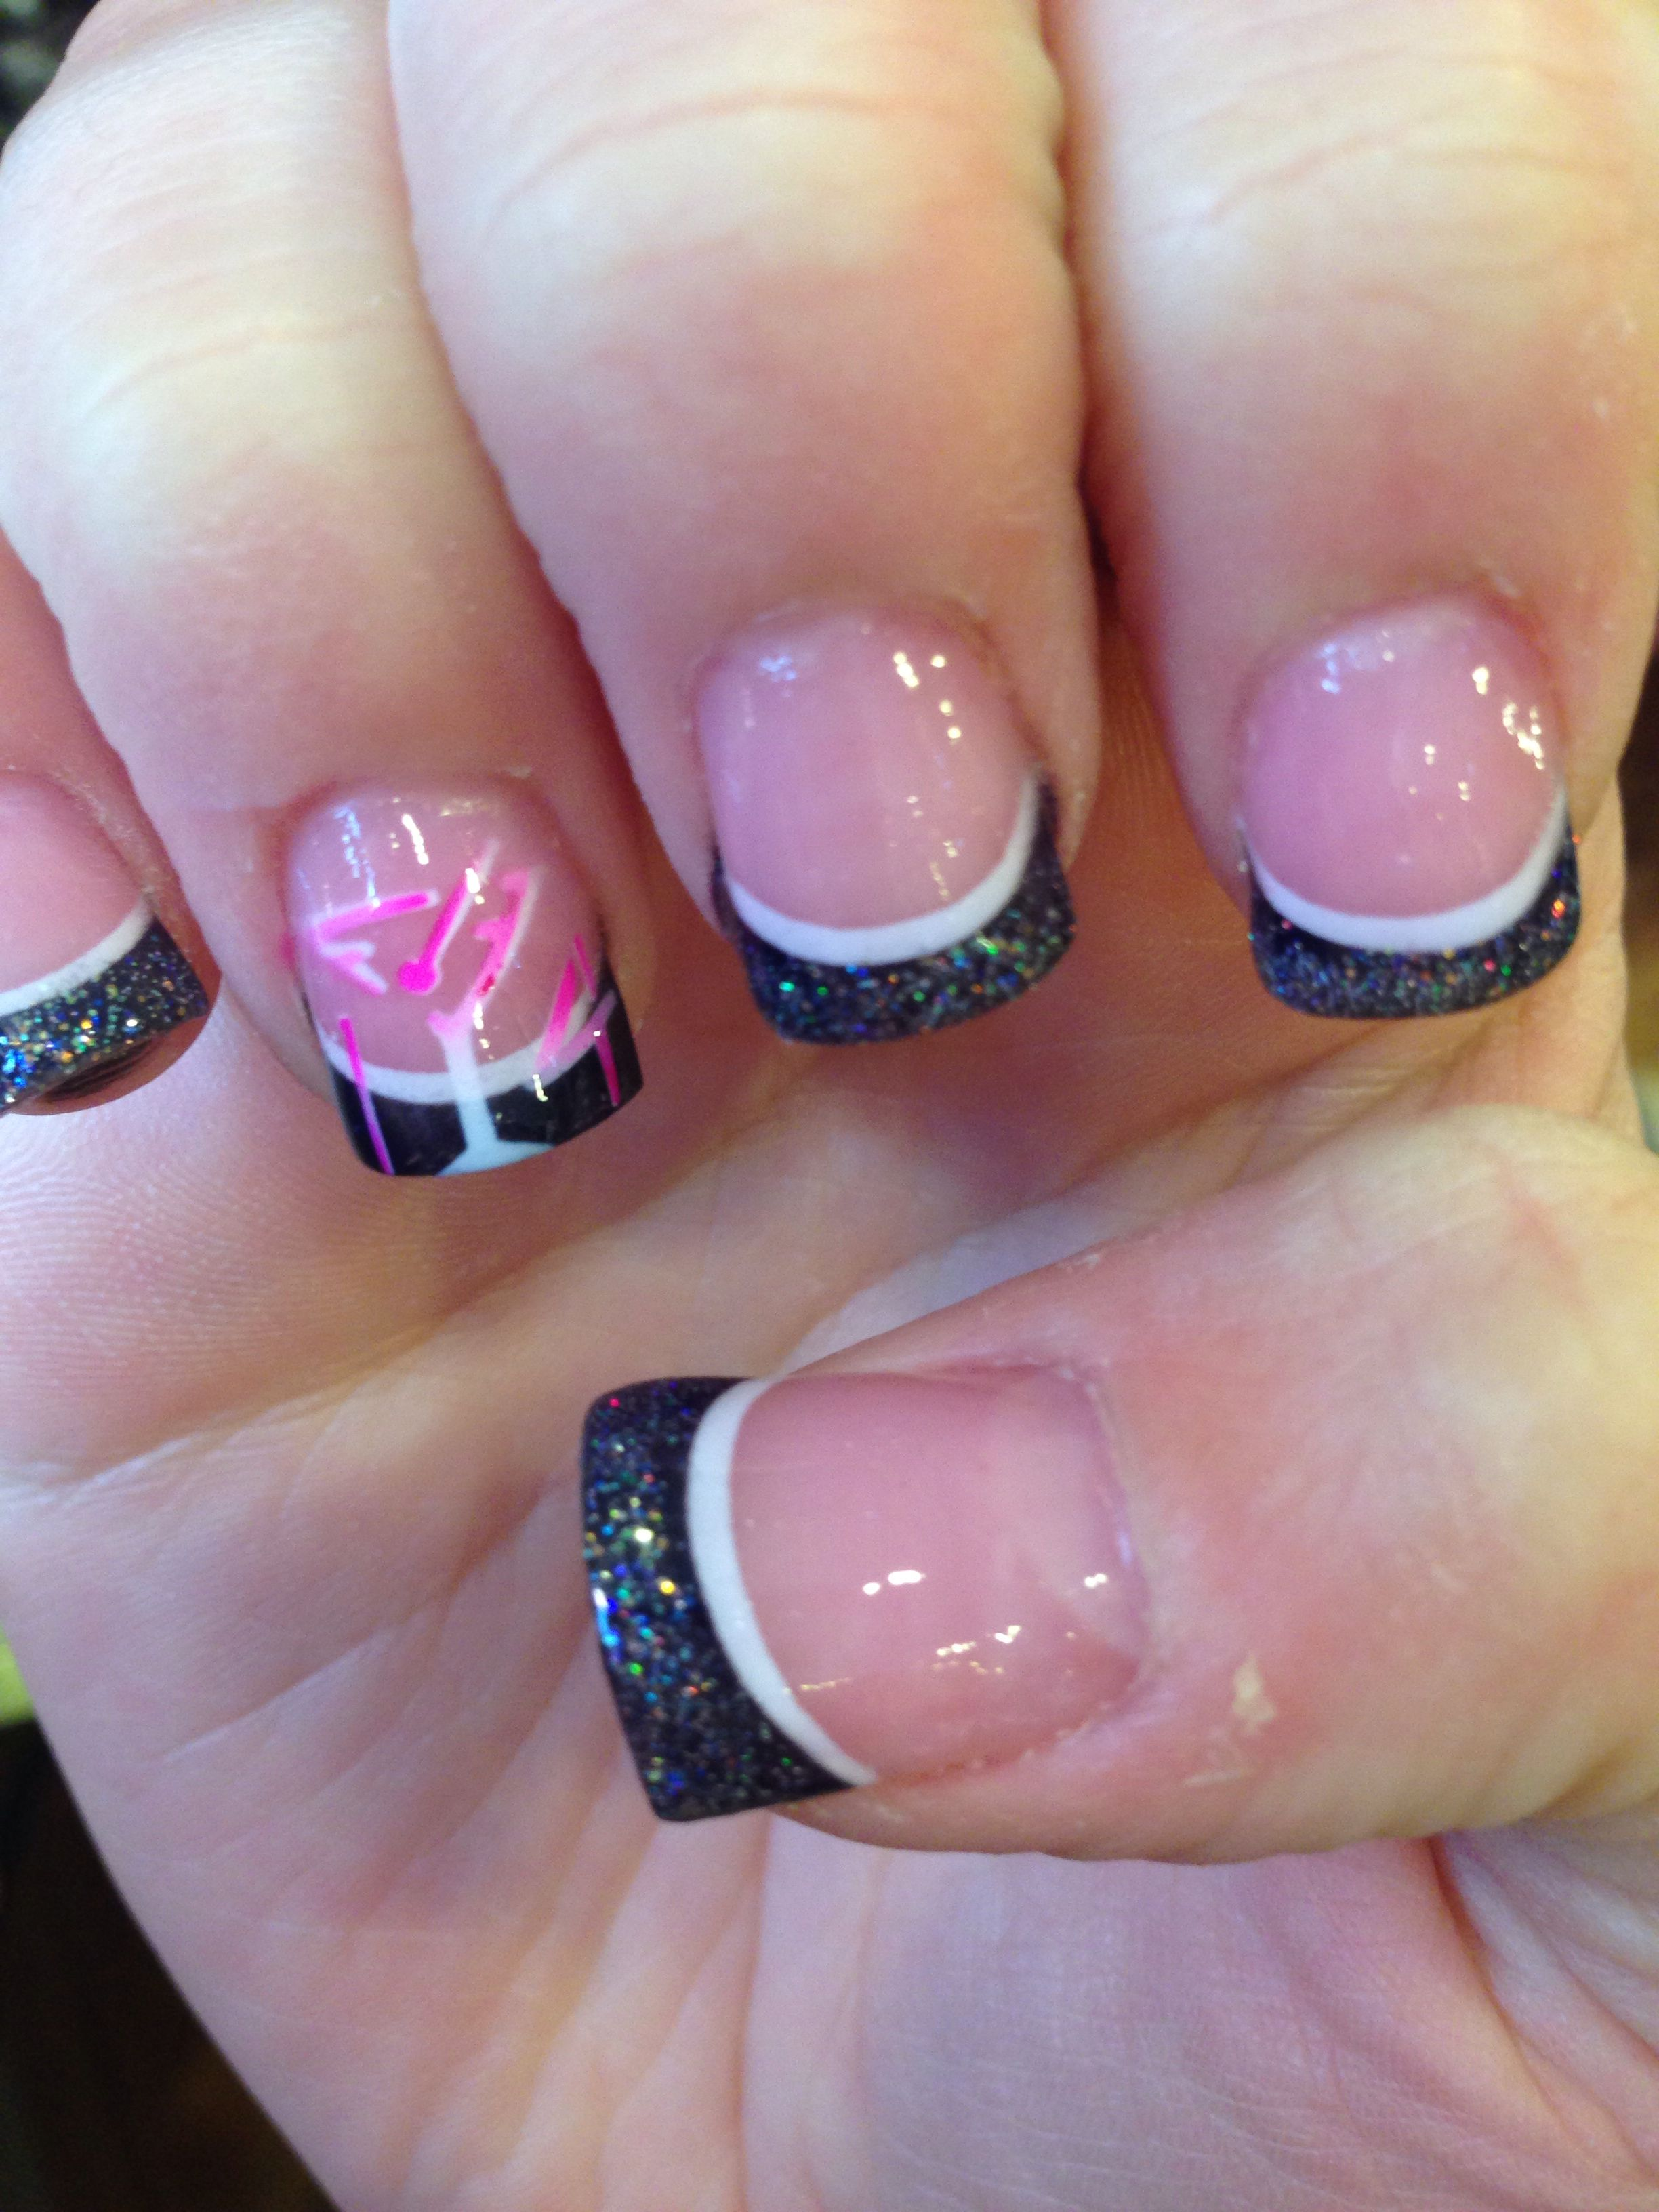 New Years Nails by Ty at Le Nails | Nail designs ...